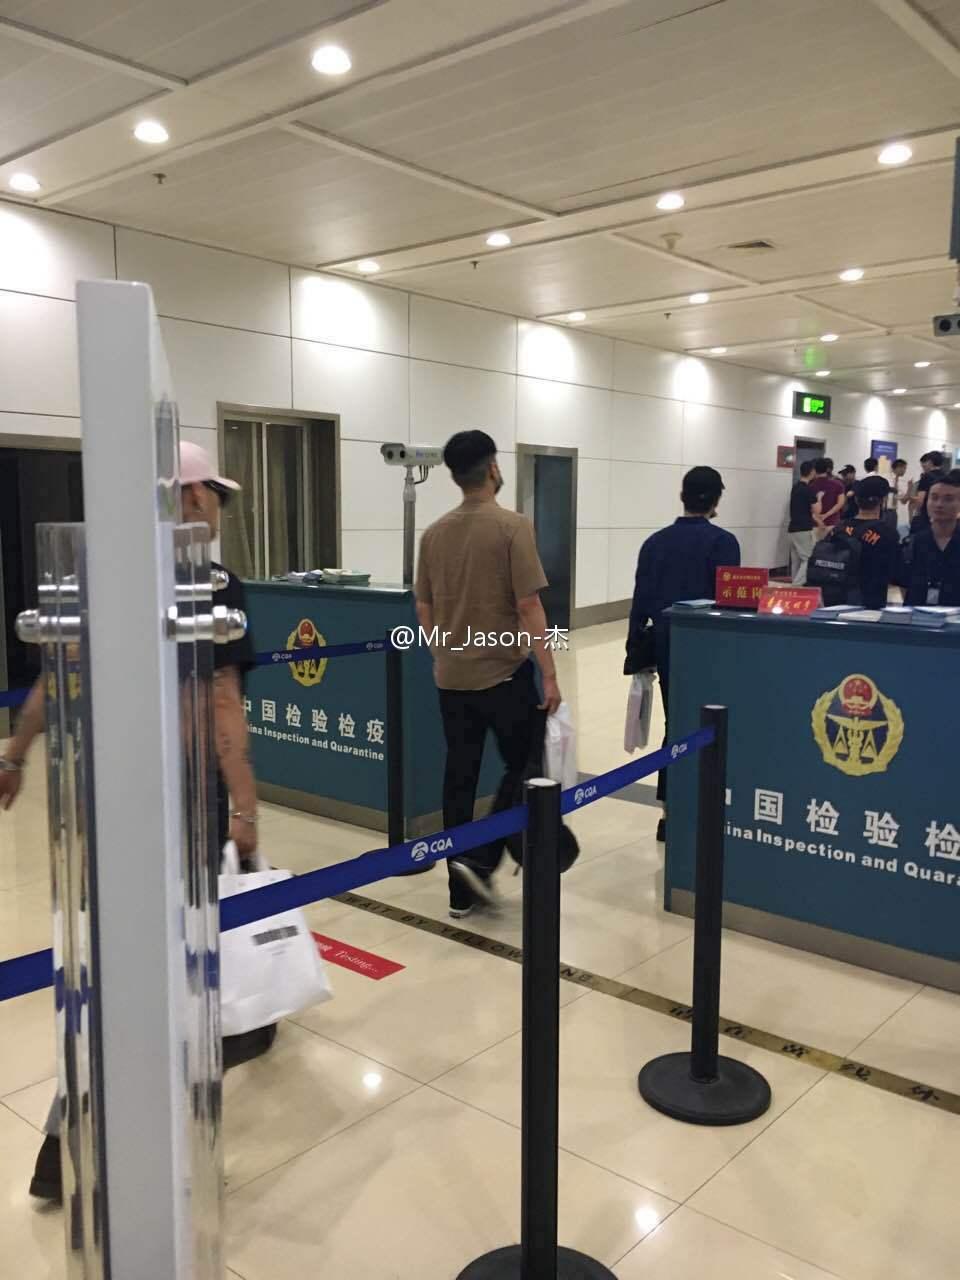 BIGBANG Arrival Chongqing 2016-06-30 (6)